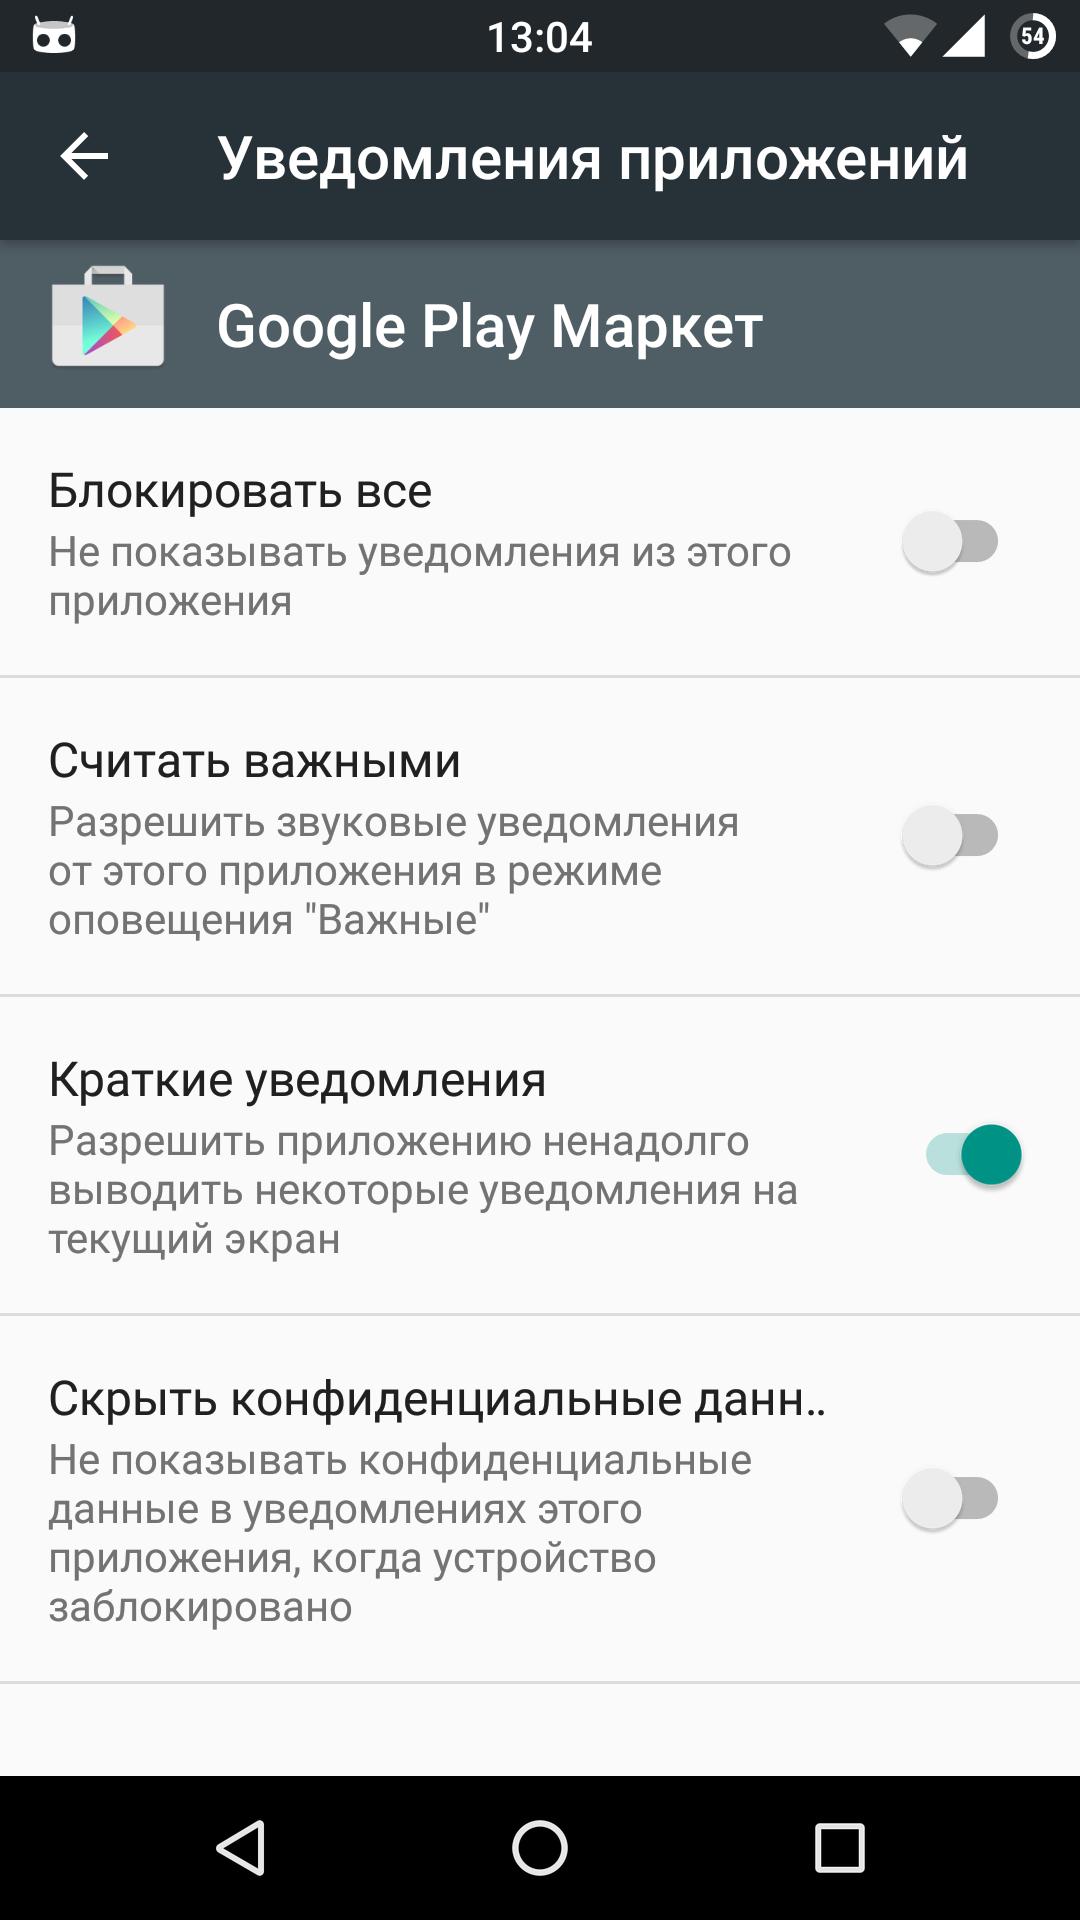 Google Play notification settings